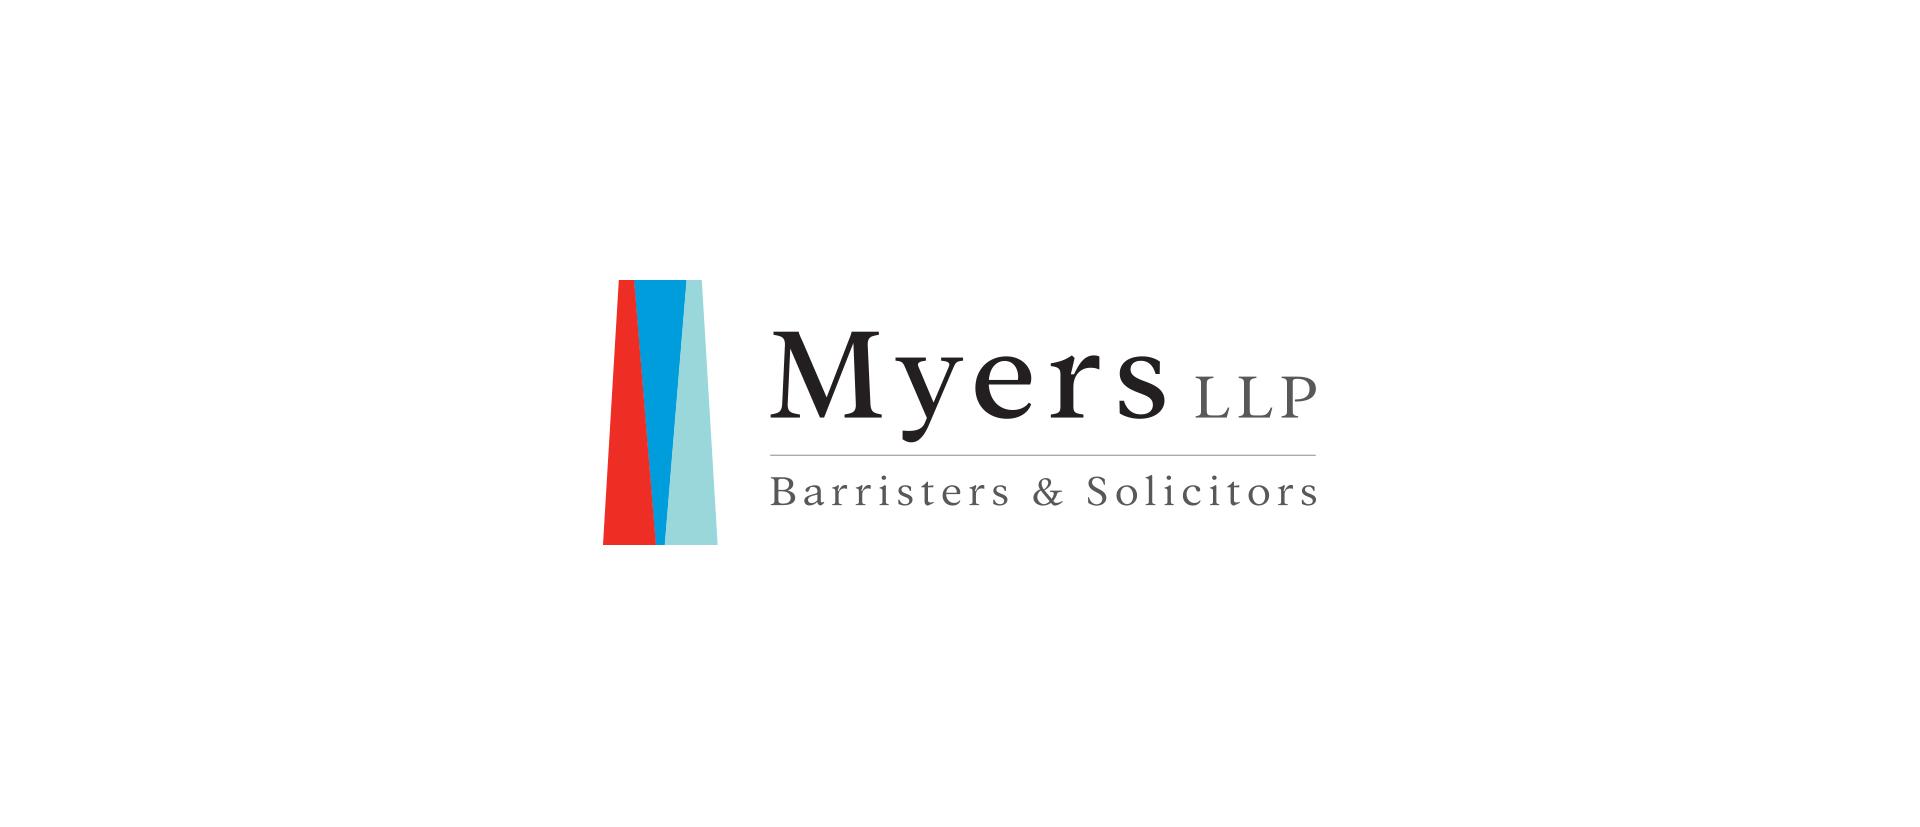 Myers LLP Branding